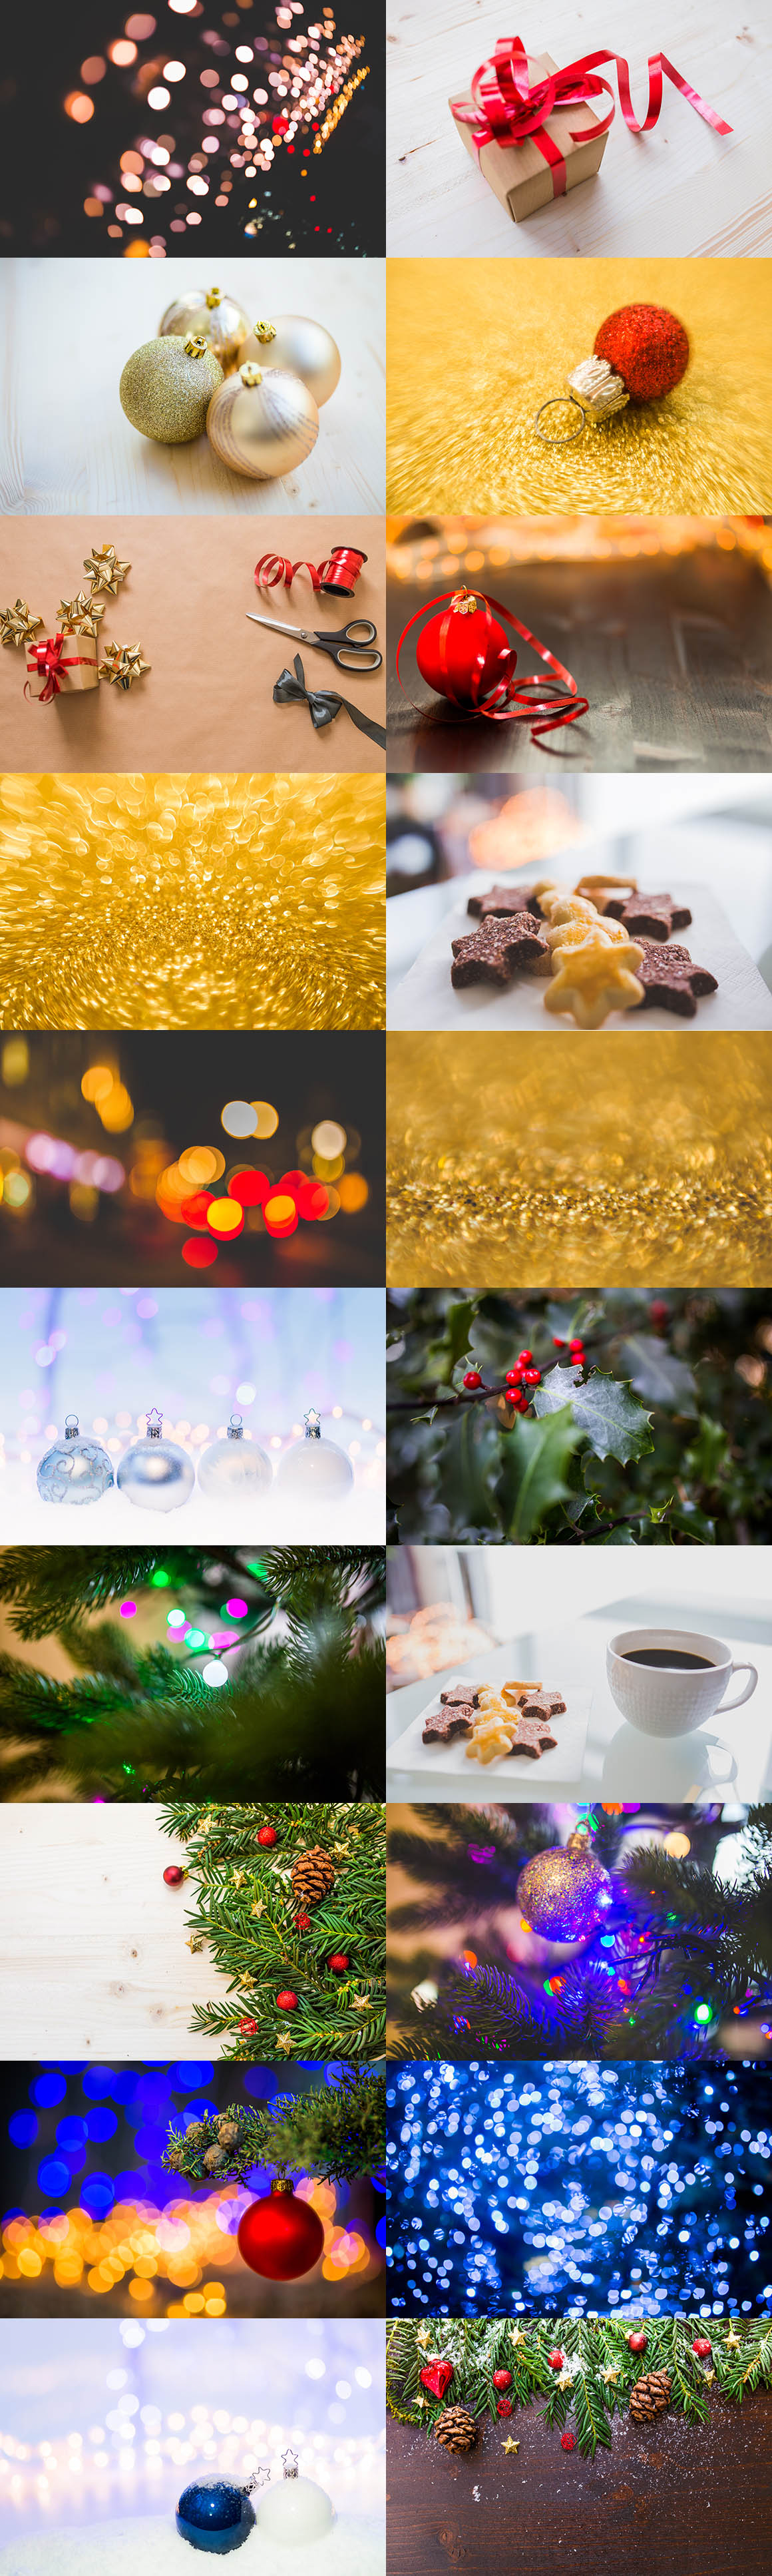 negativespace-christmas-2